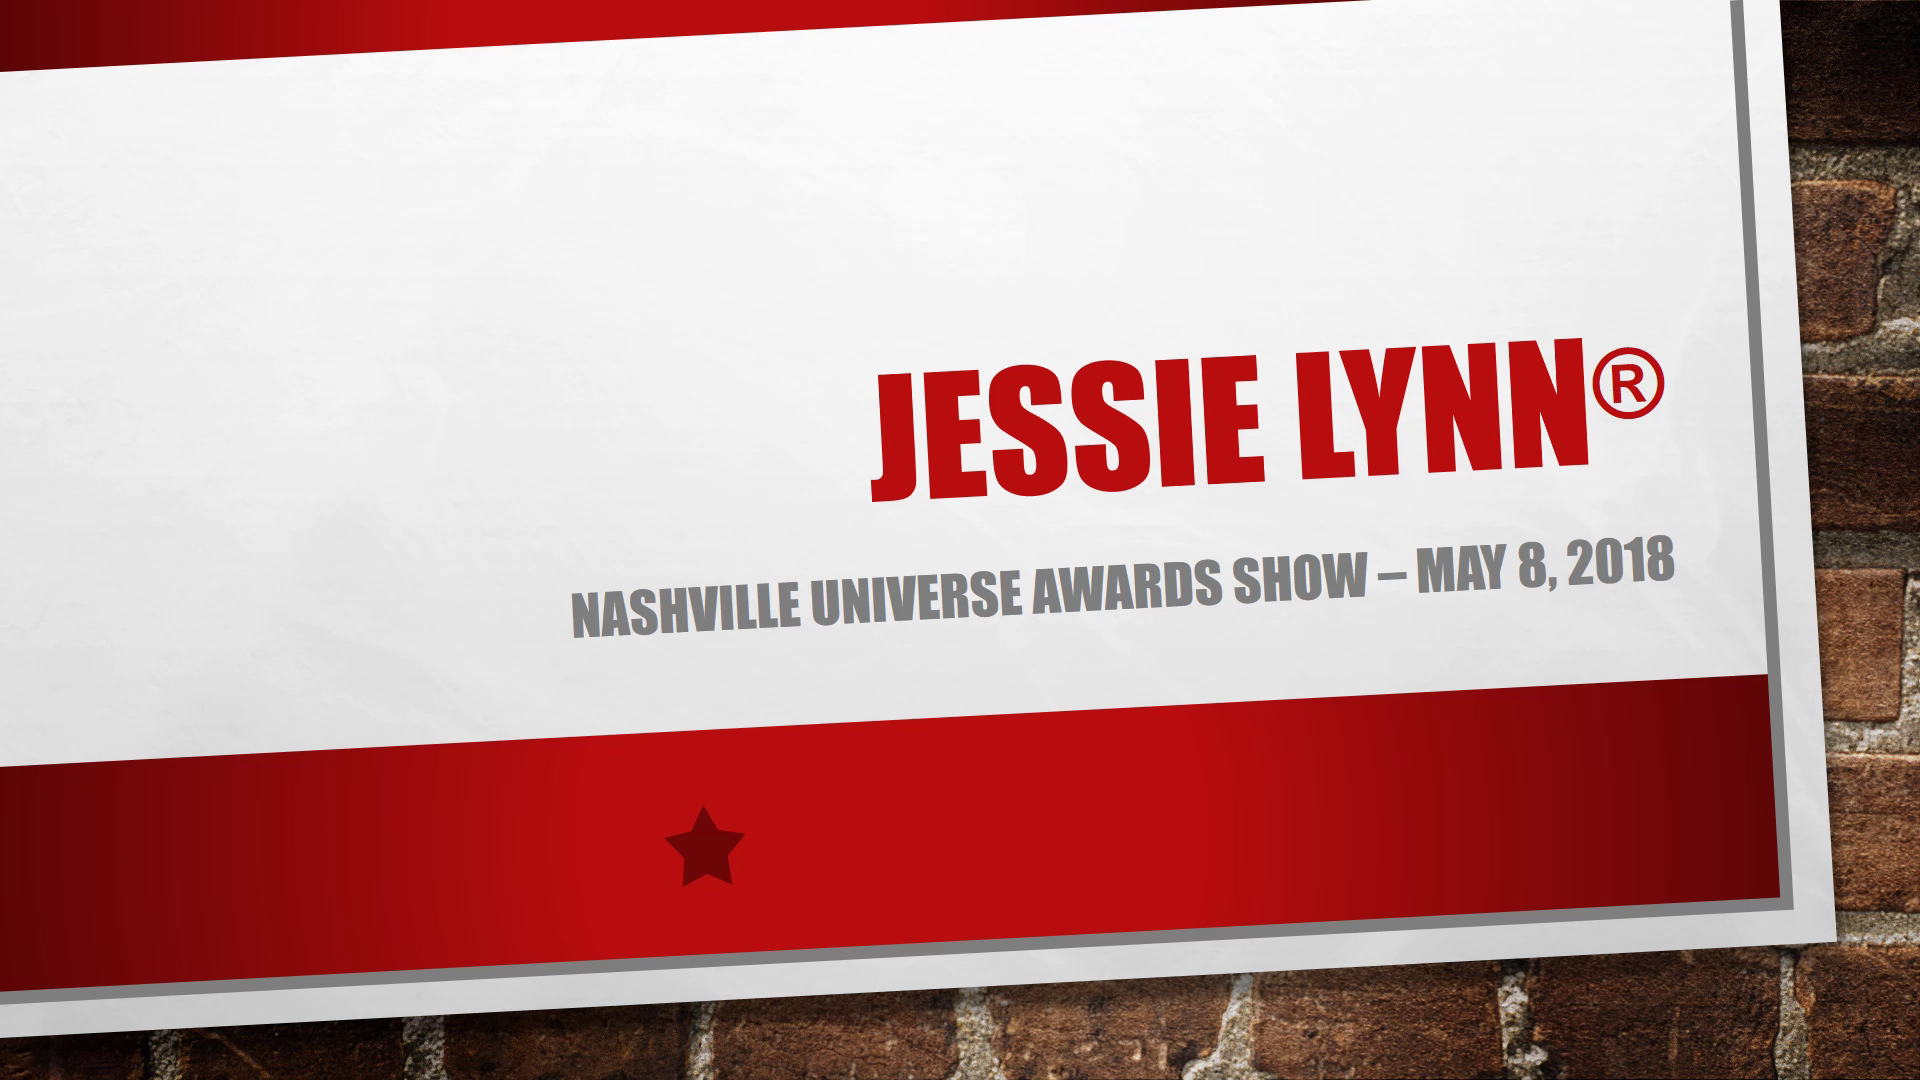 Jessie Lynn - Nashville Universe Awards